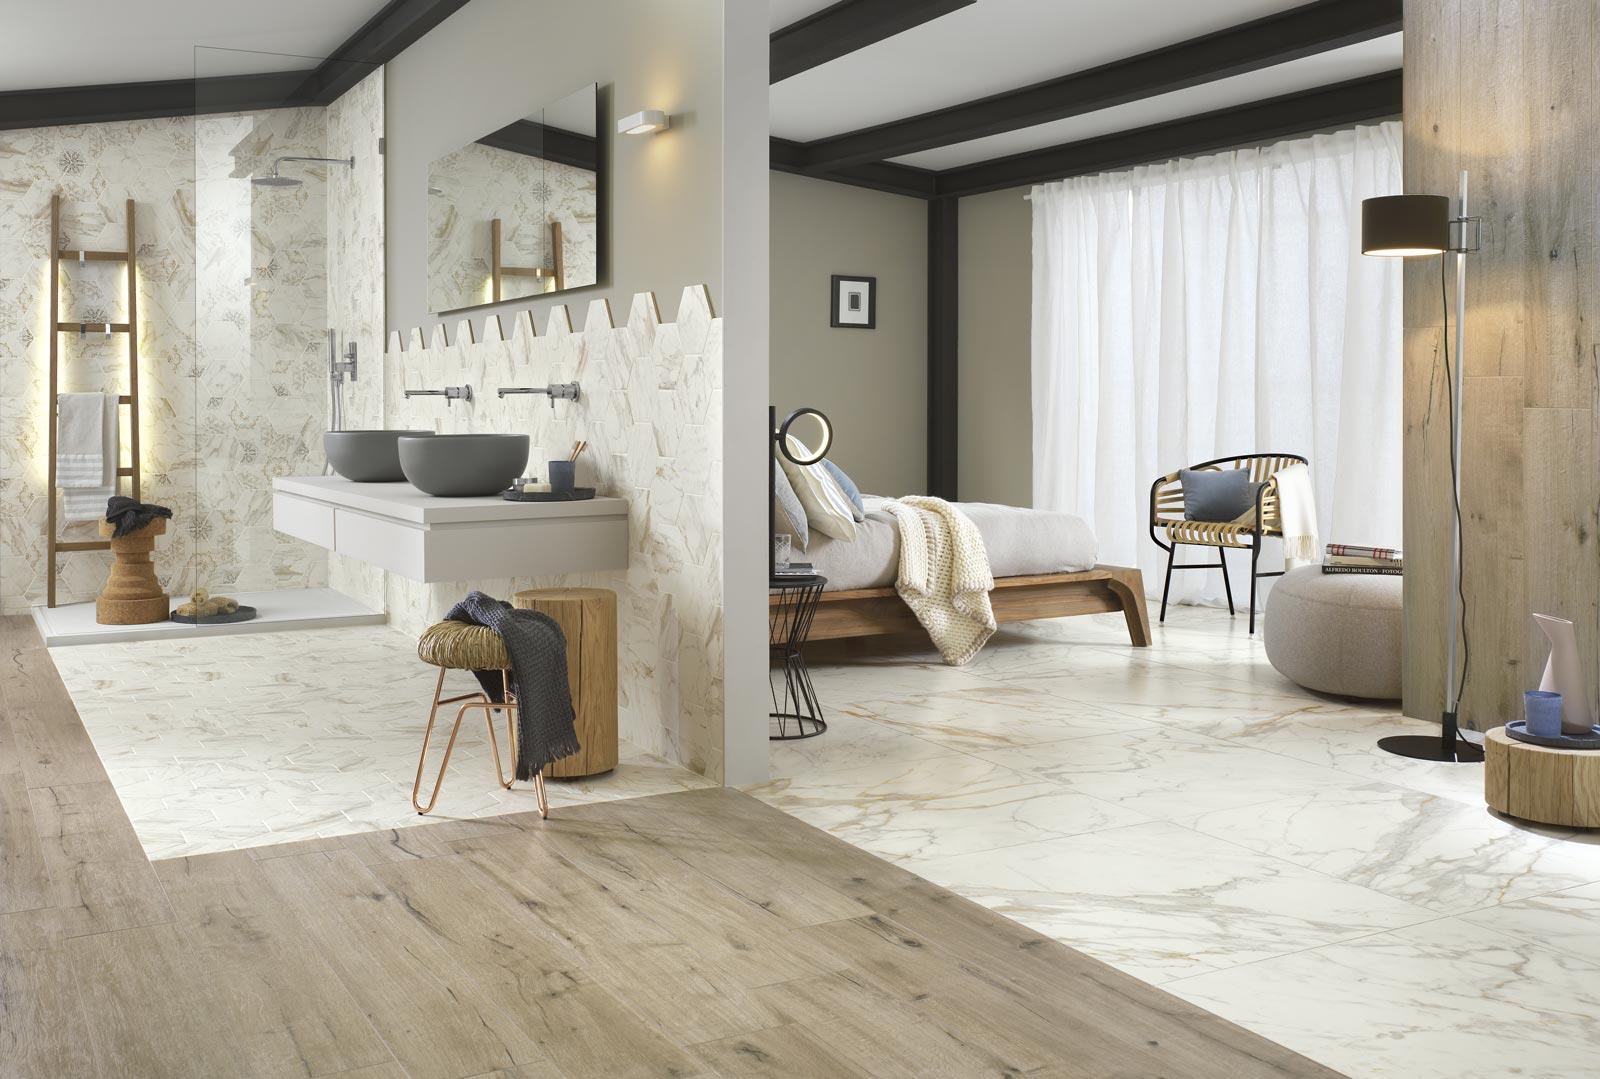 Luxe slaapkamer badkamer suite   HOMEASE